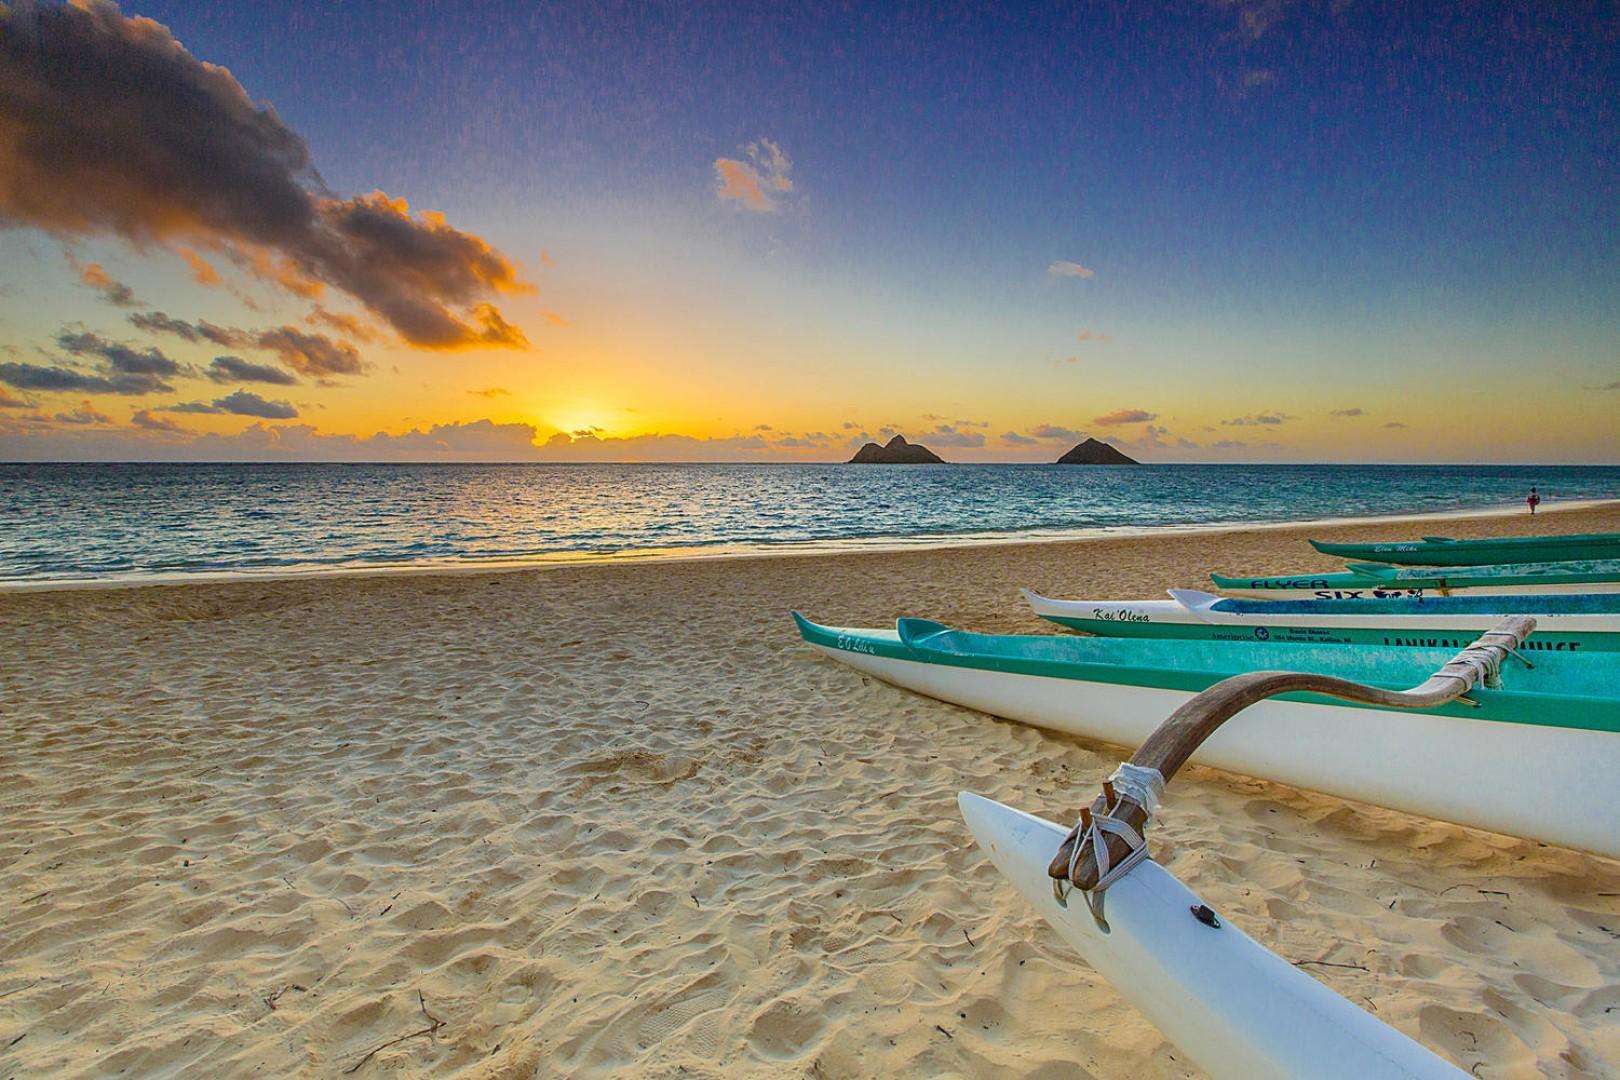 Lanikai Beach: a short five- to 10-minute walk or one-minute drive away.